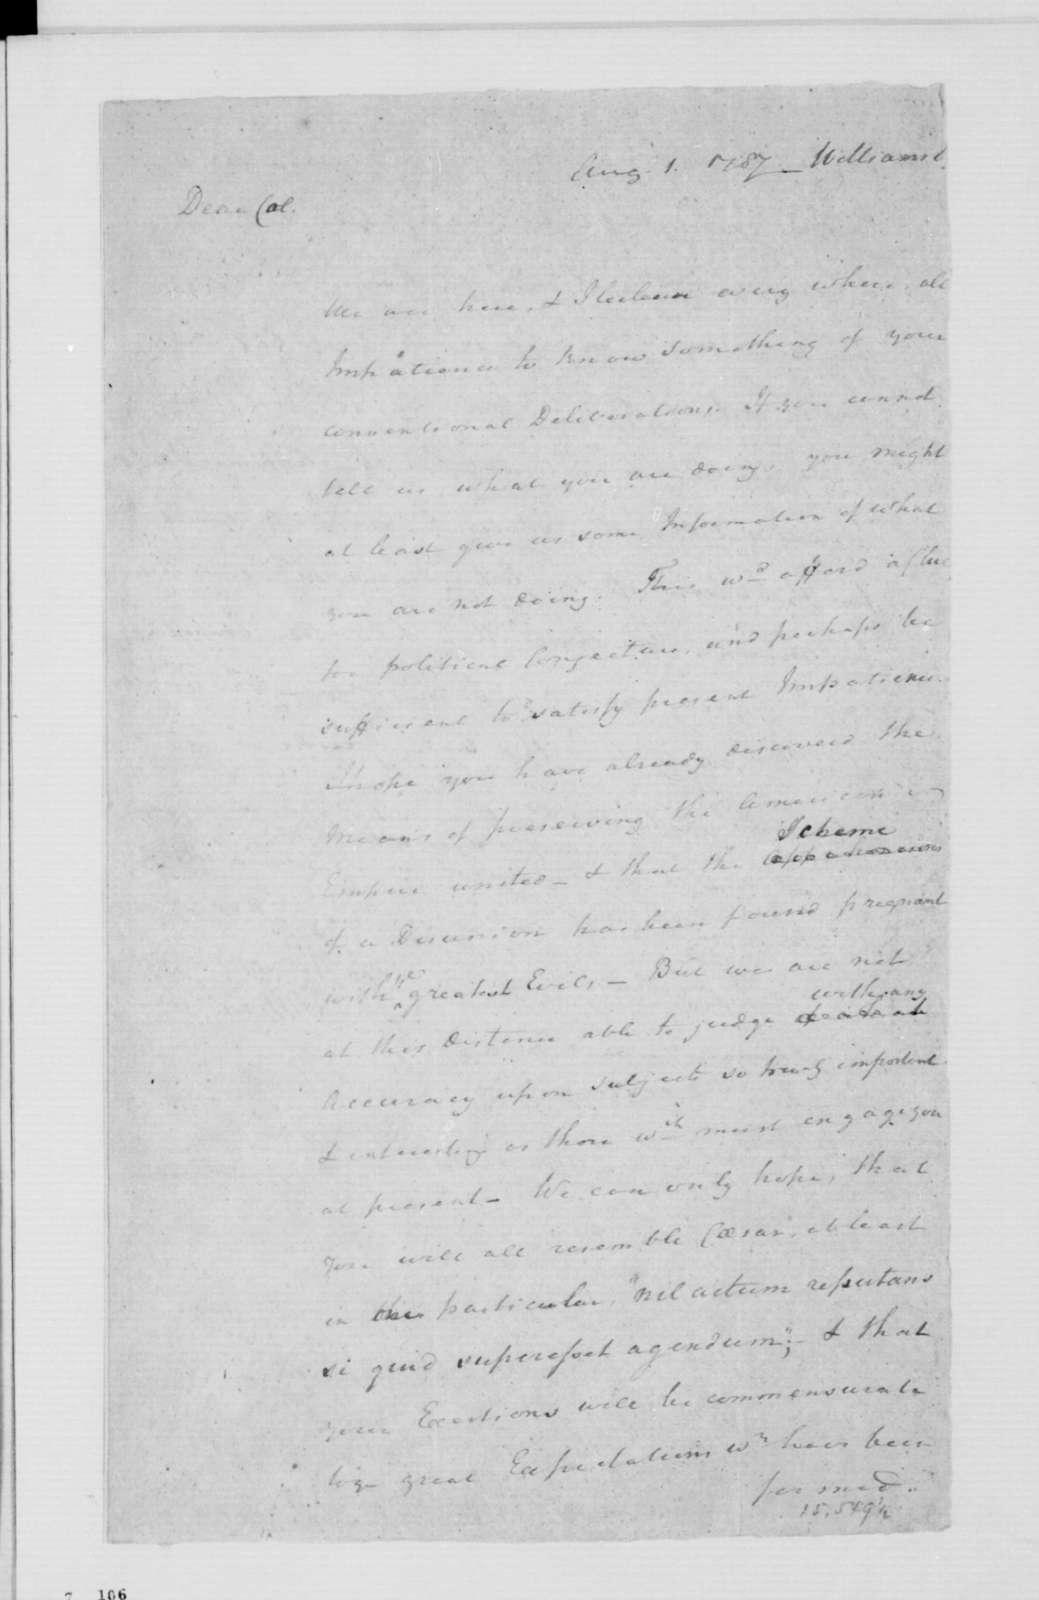 Rev. James Madison to James Madison, August 1, 1787.